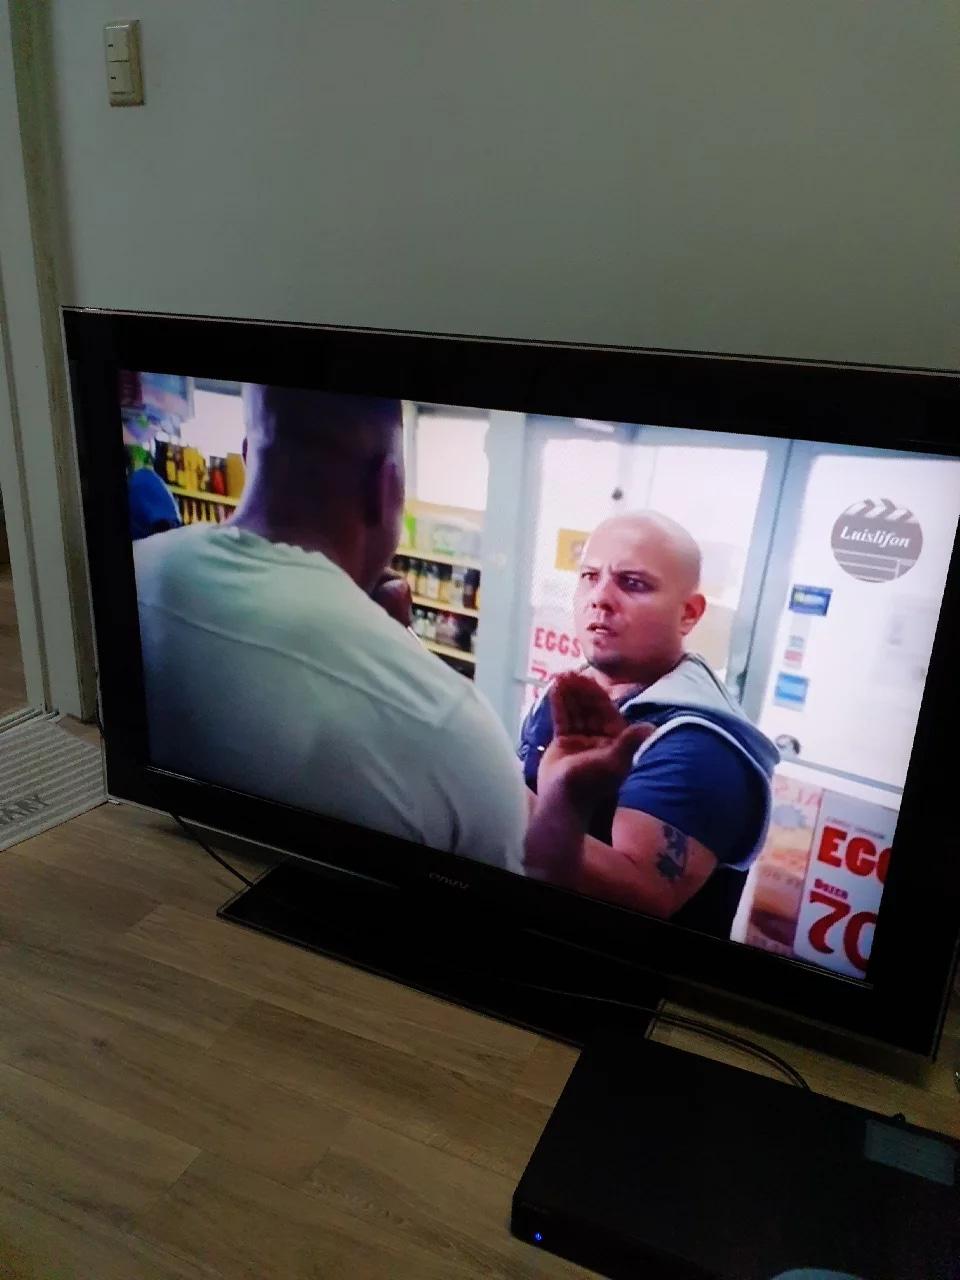 LCD 52 inch 삼숨 TV + DVD player